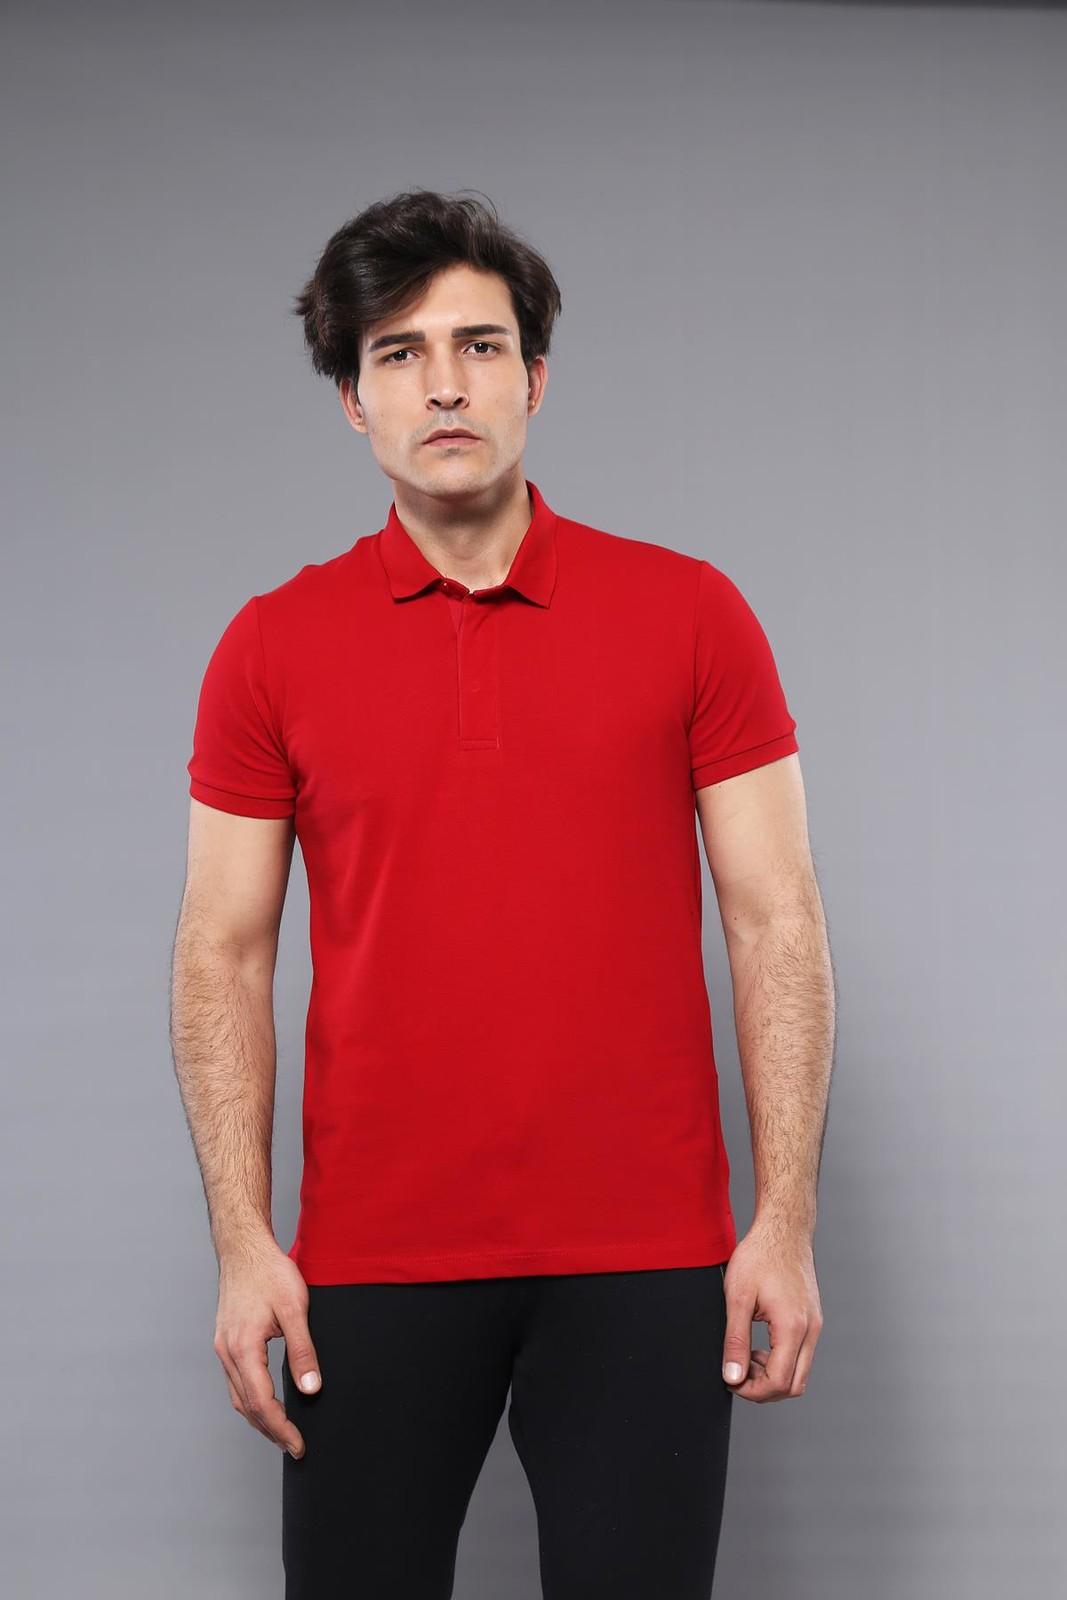 Men's Plain Red Polo T-shirt